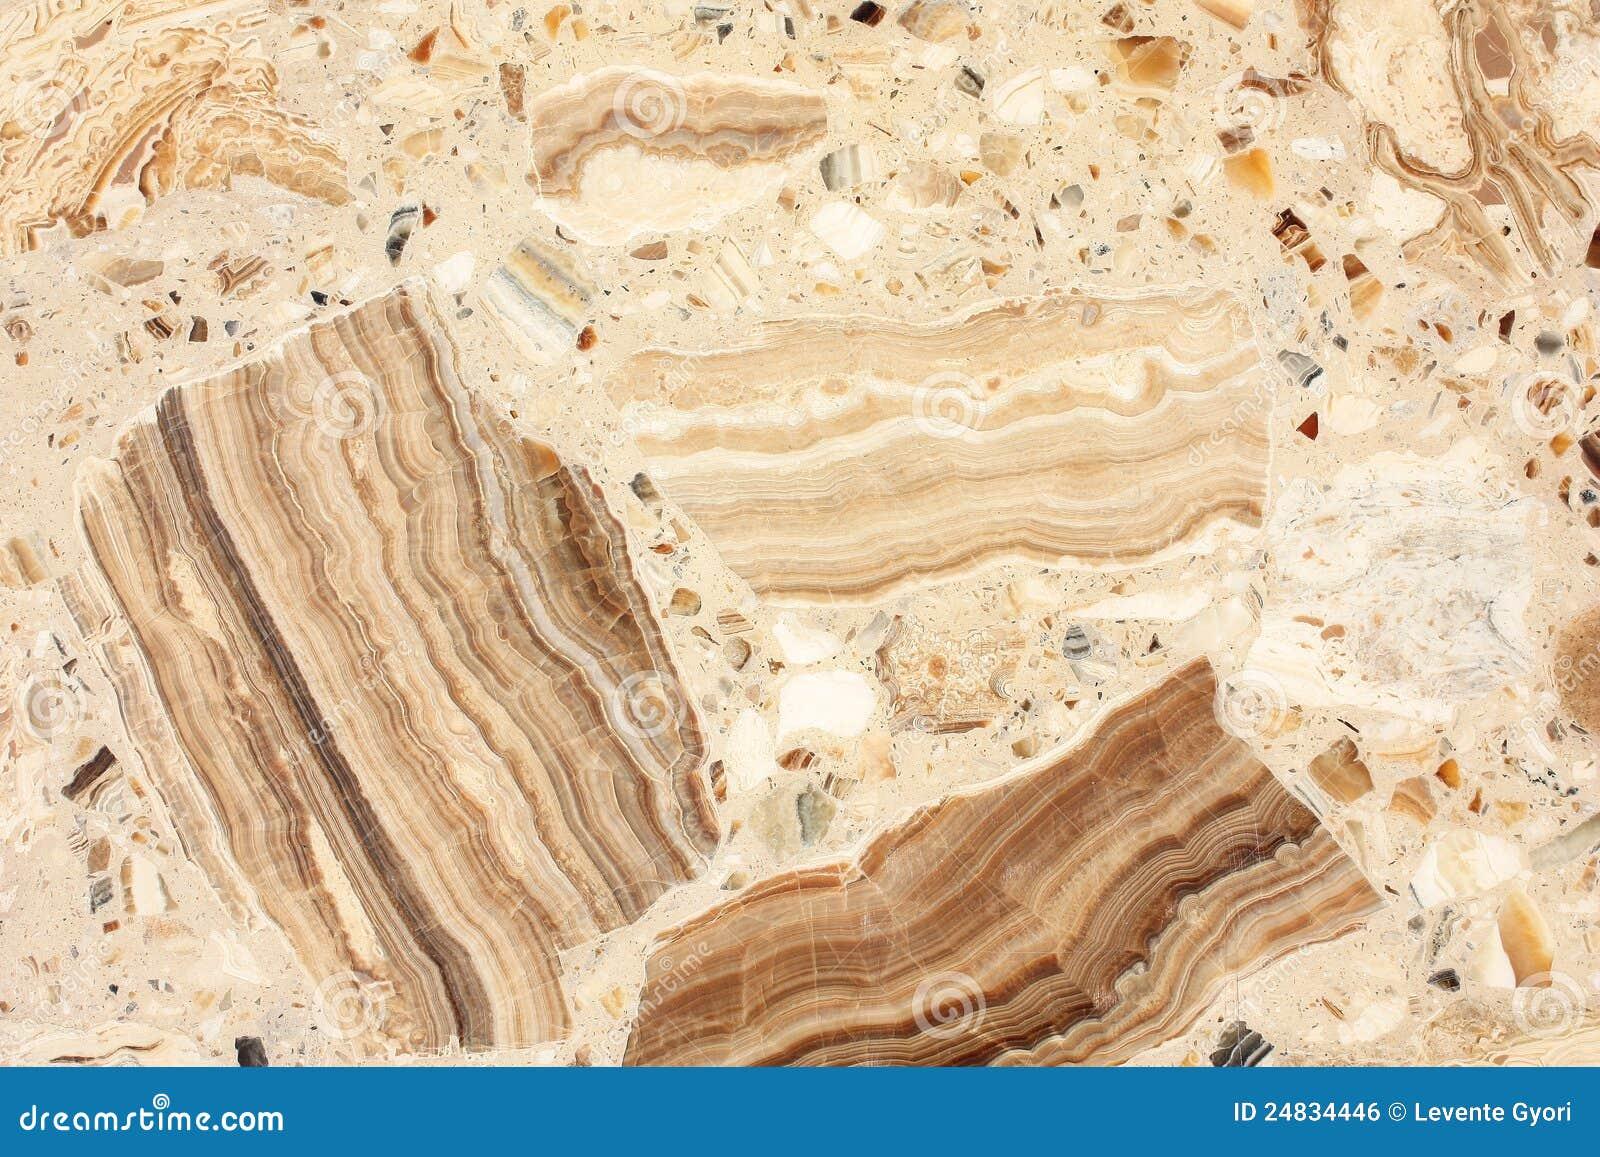 Marble floor tile bathroom - Marble Stone Background Royalty Free Stock Image Image